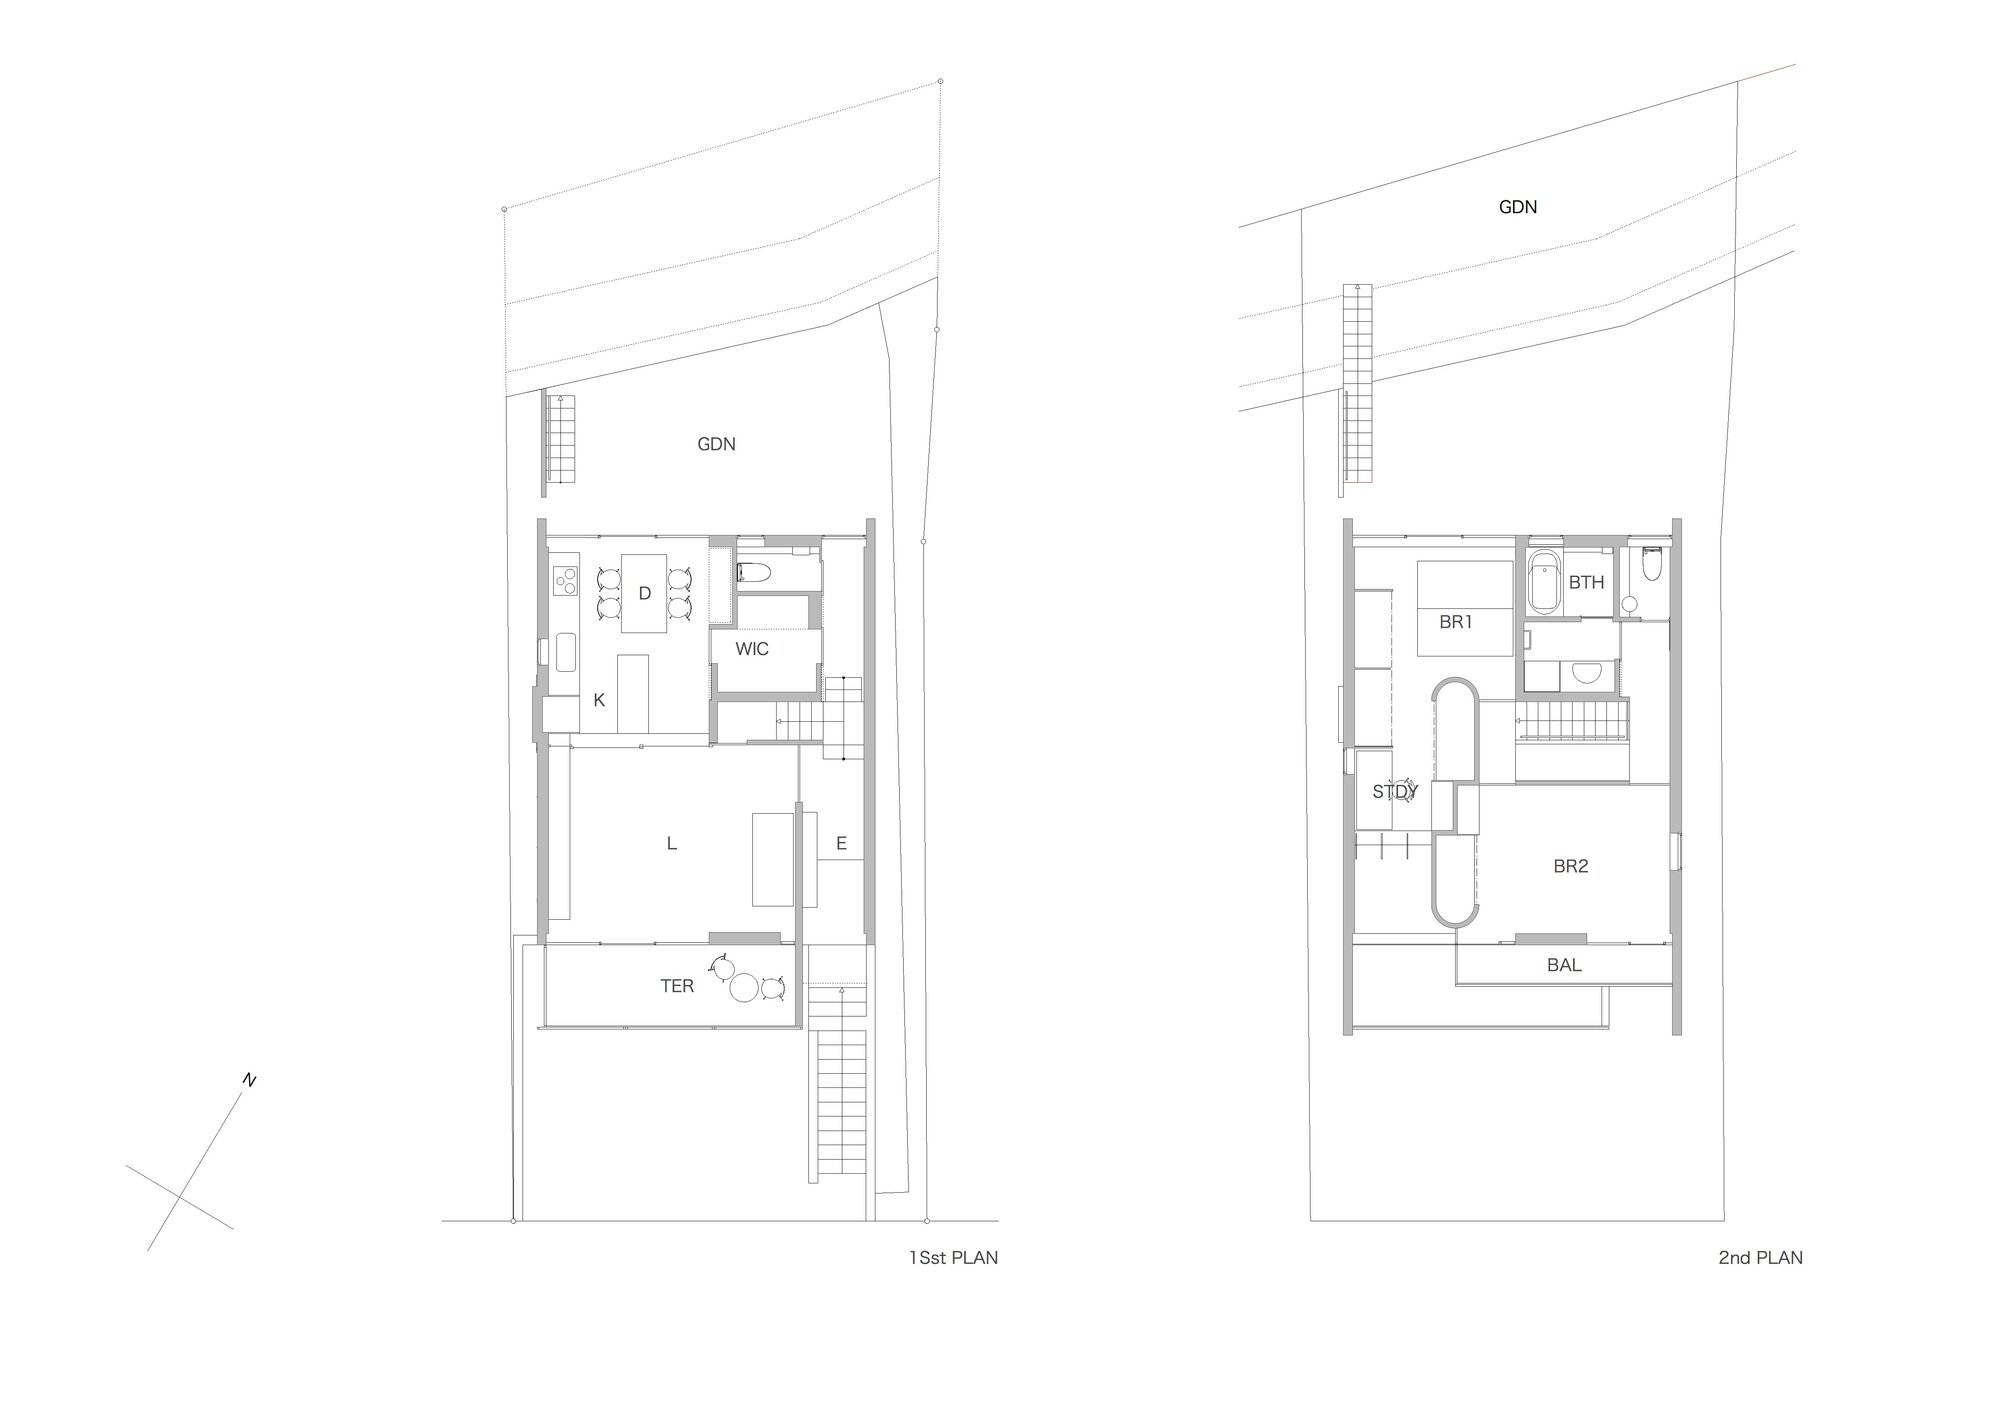 House in Midorigaoka - Yutaka Yoshida Architect & Associates - Japan - Floor Plans - Humble Homes